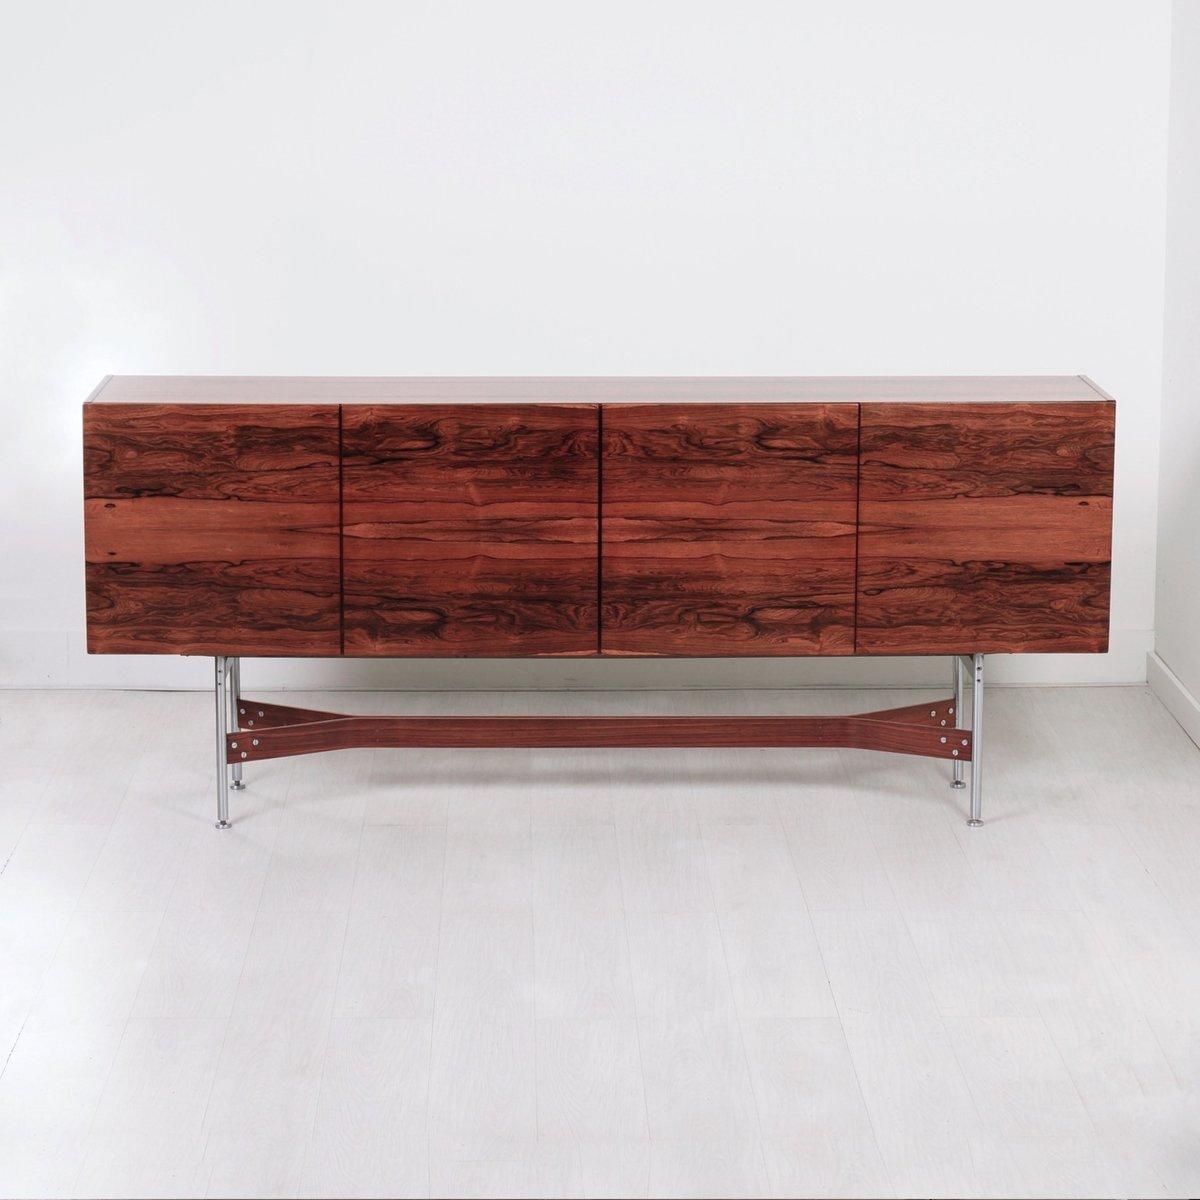 Rosewood Sideboard by Rudolf Glatzel for Fristho, 1960s